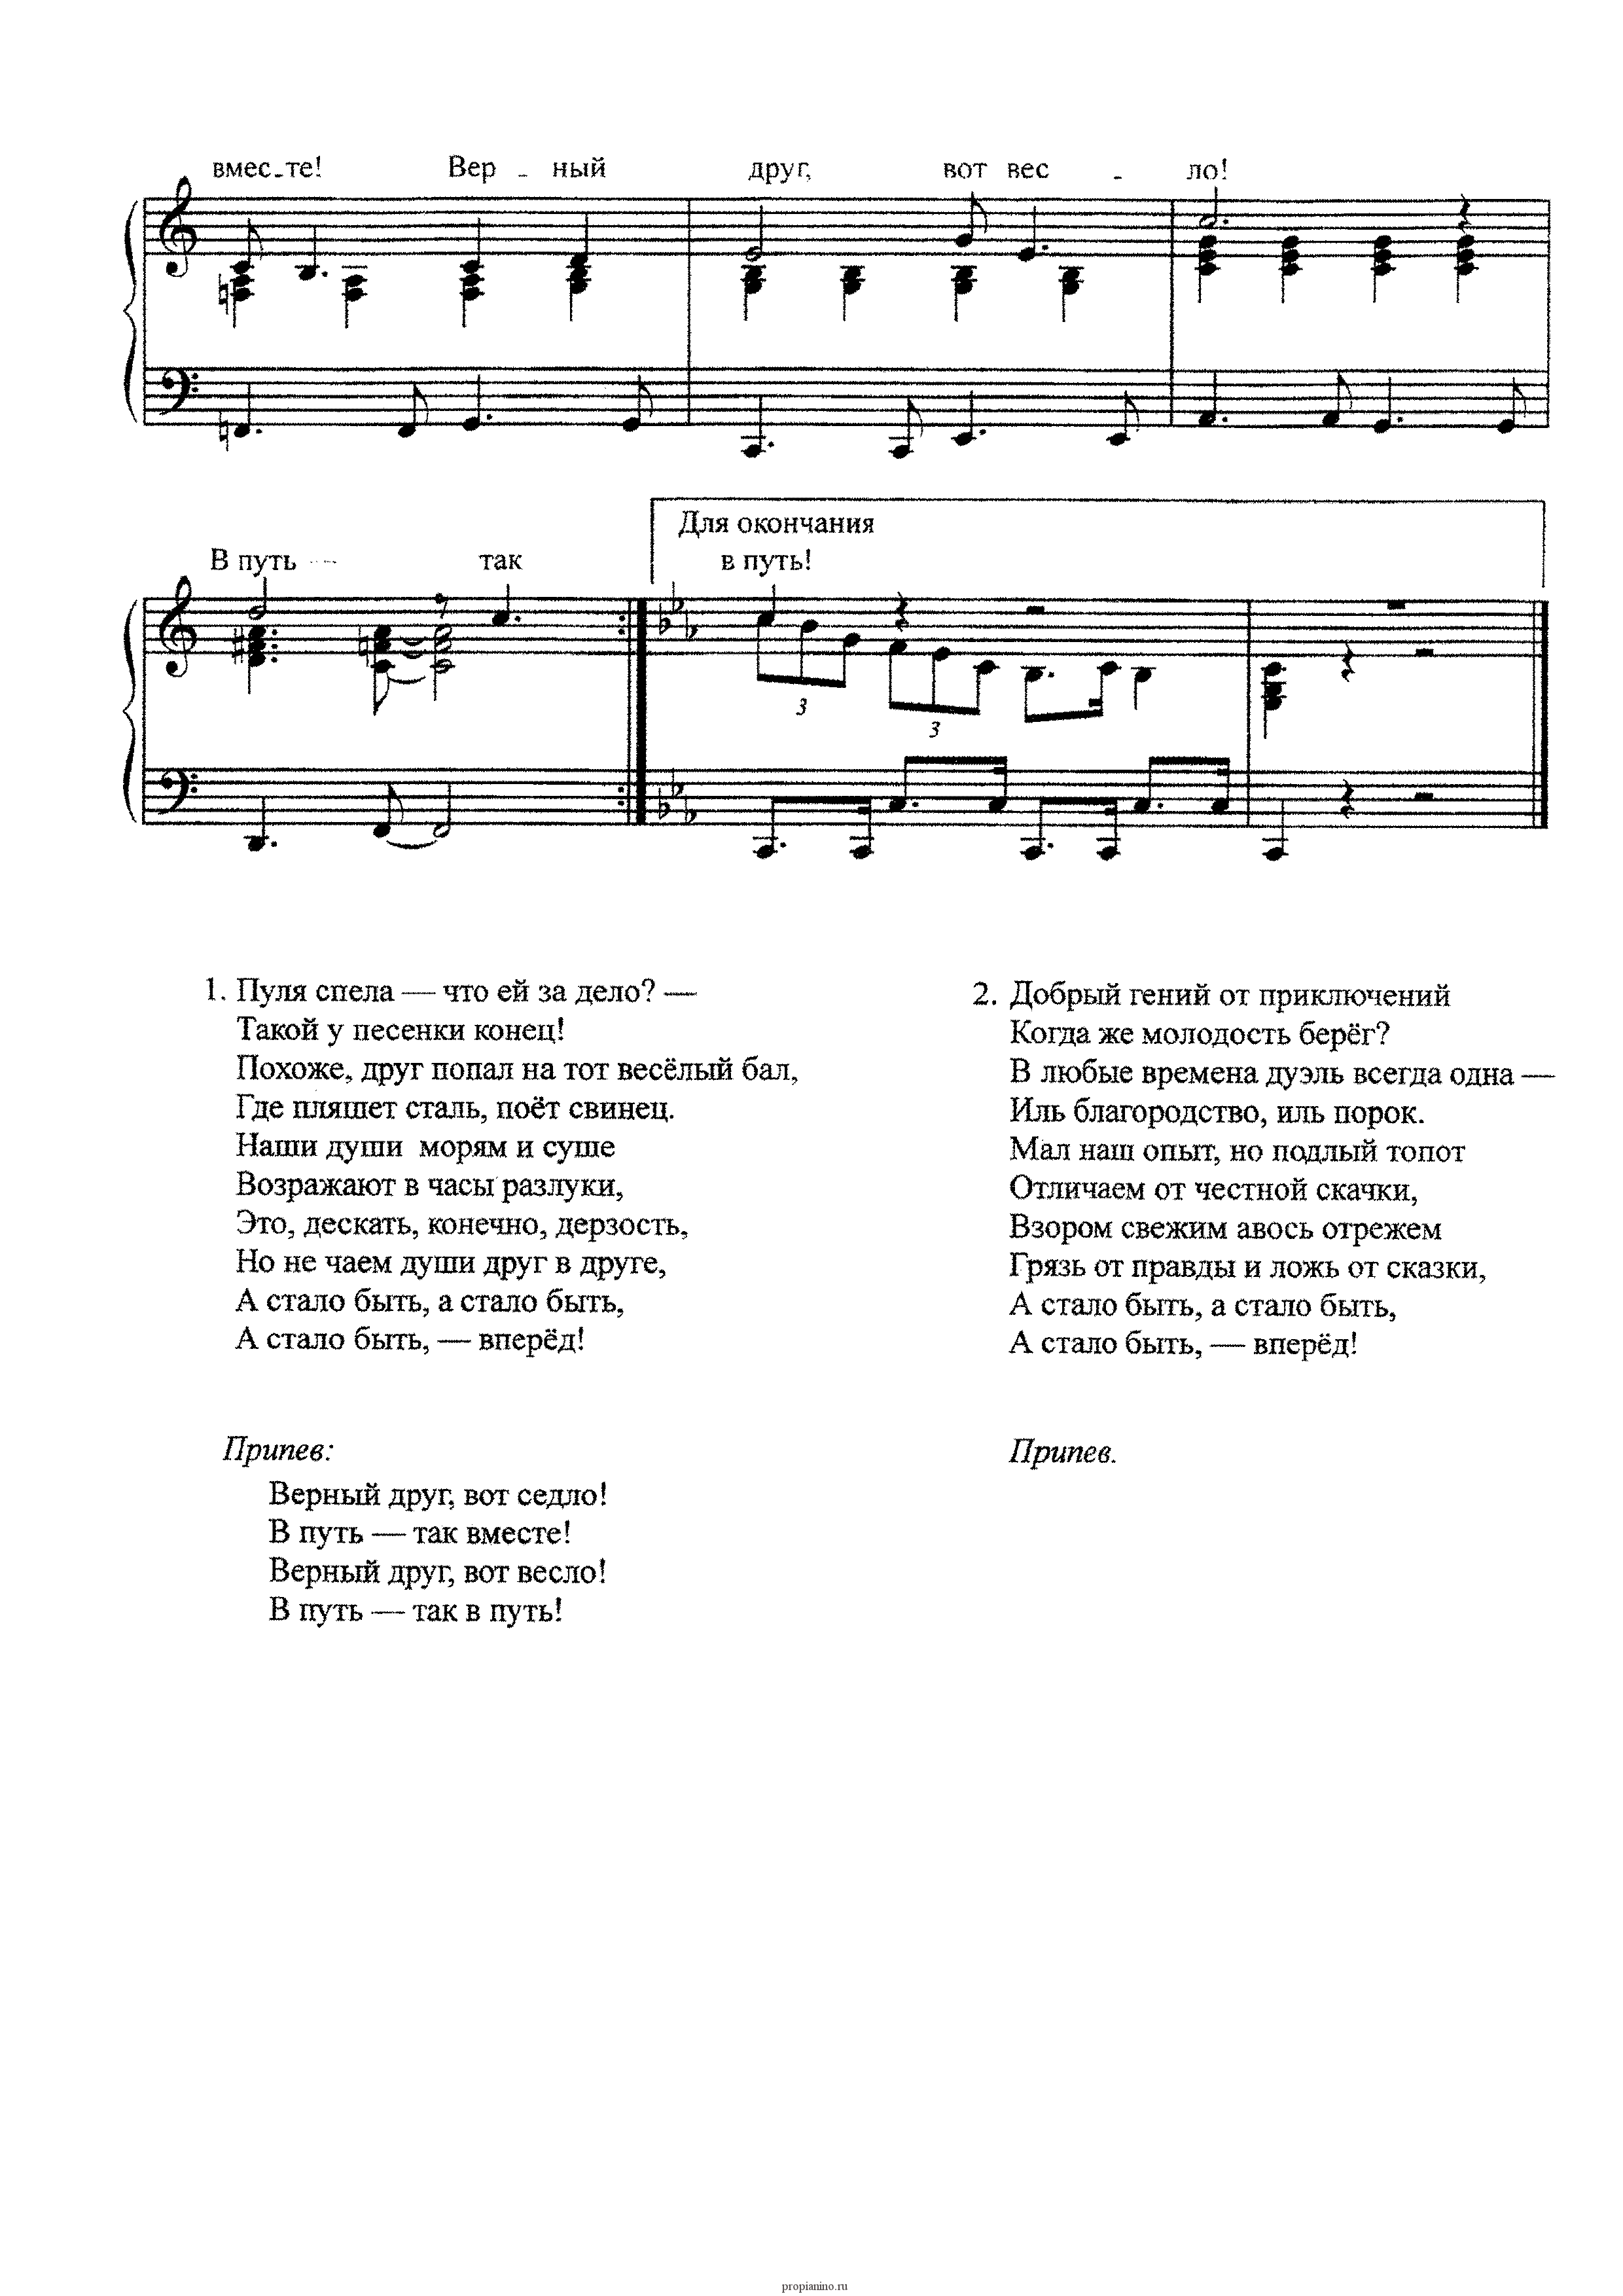 Гардемарины вперед песни разлука текст